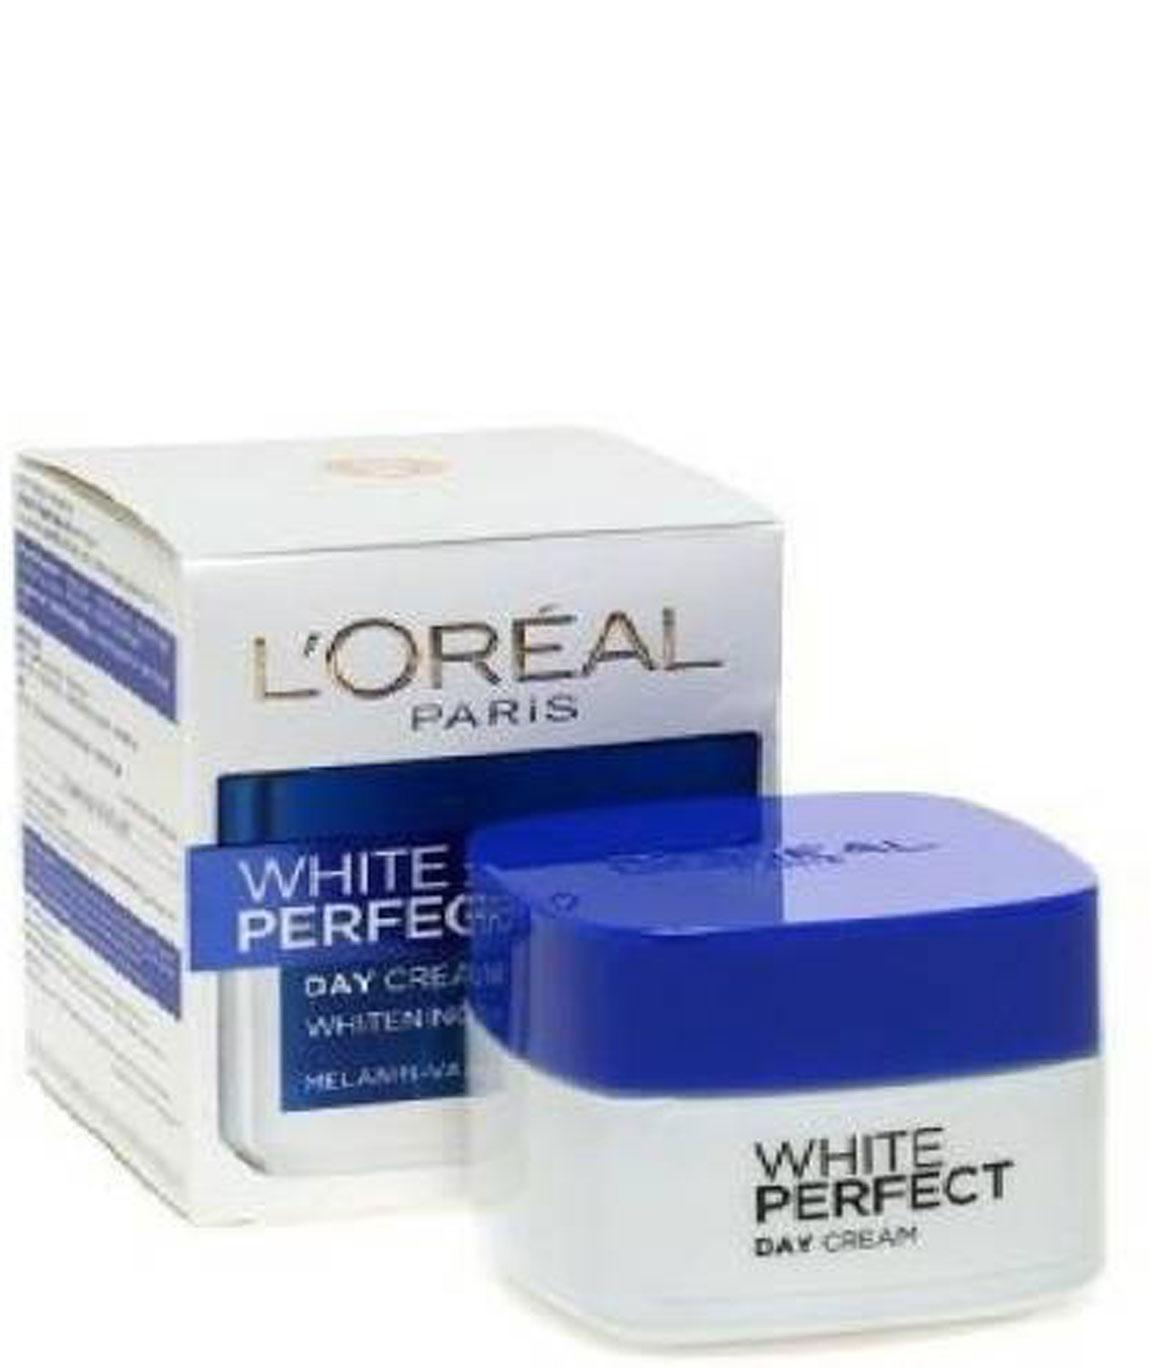 L`Oreal Paris White Perfect Day Cream, 50ml